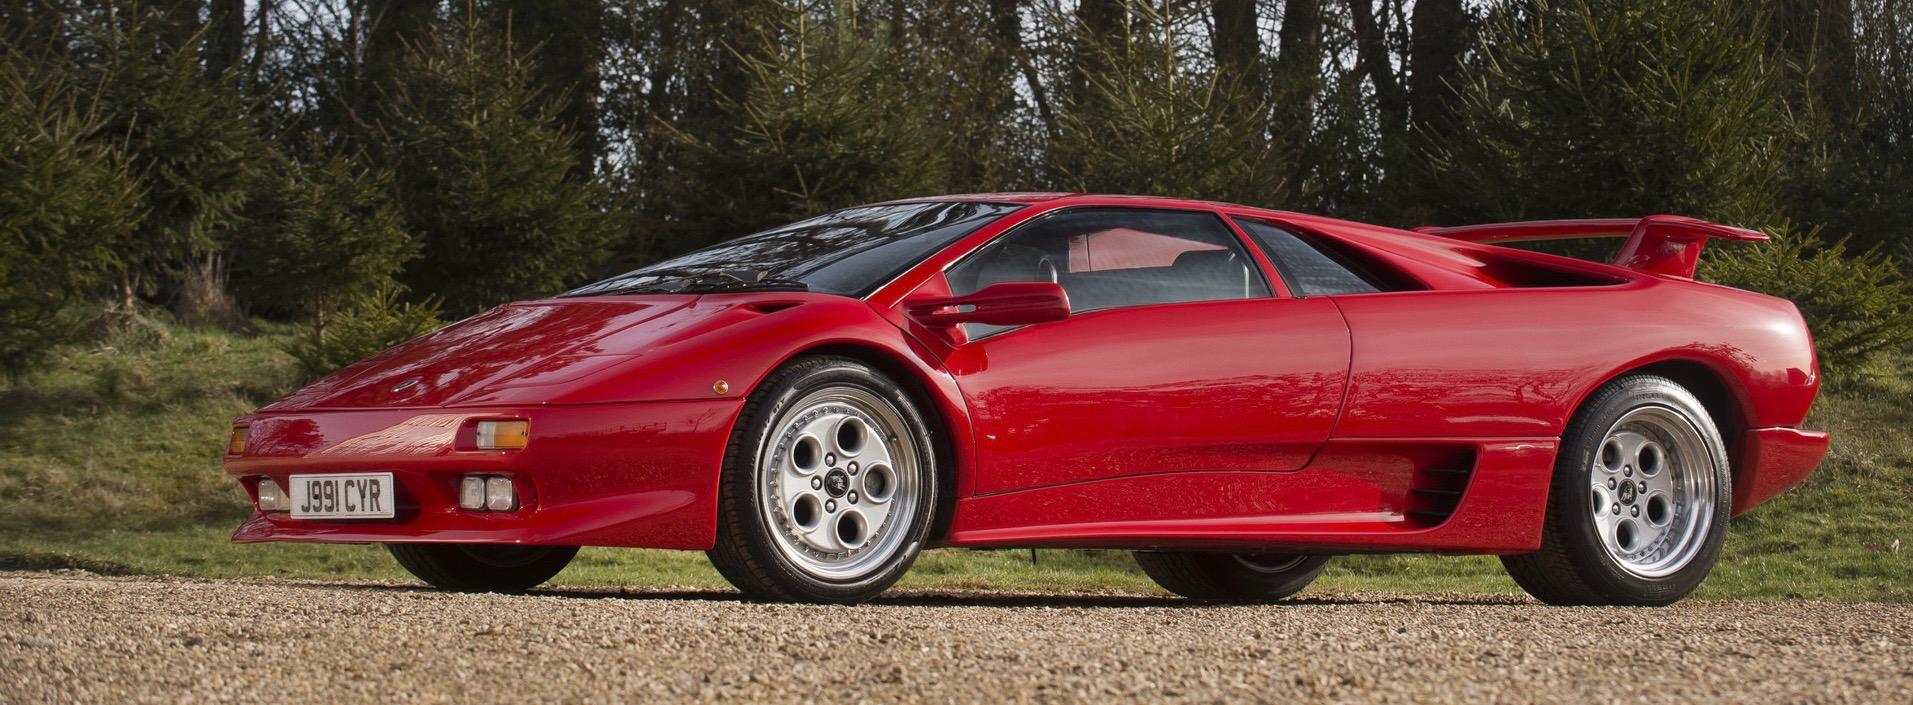 Rock star exotics at Bonhams' collector car auction | ClassicCars